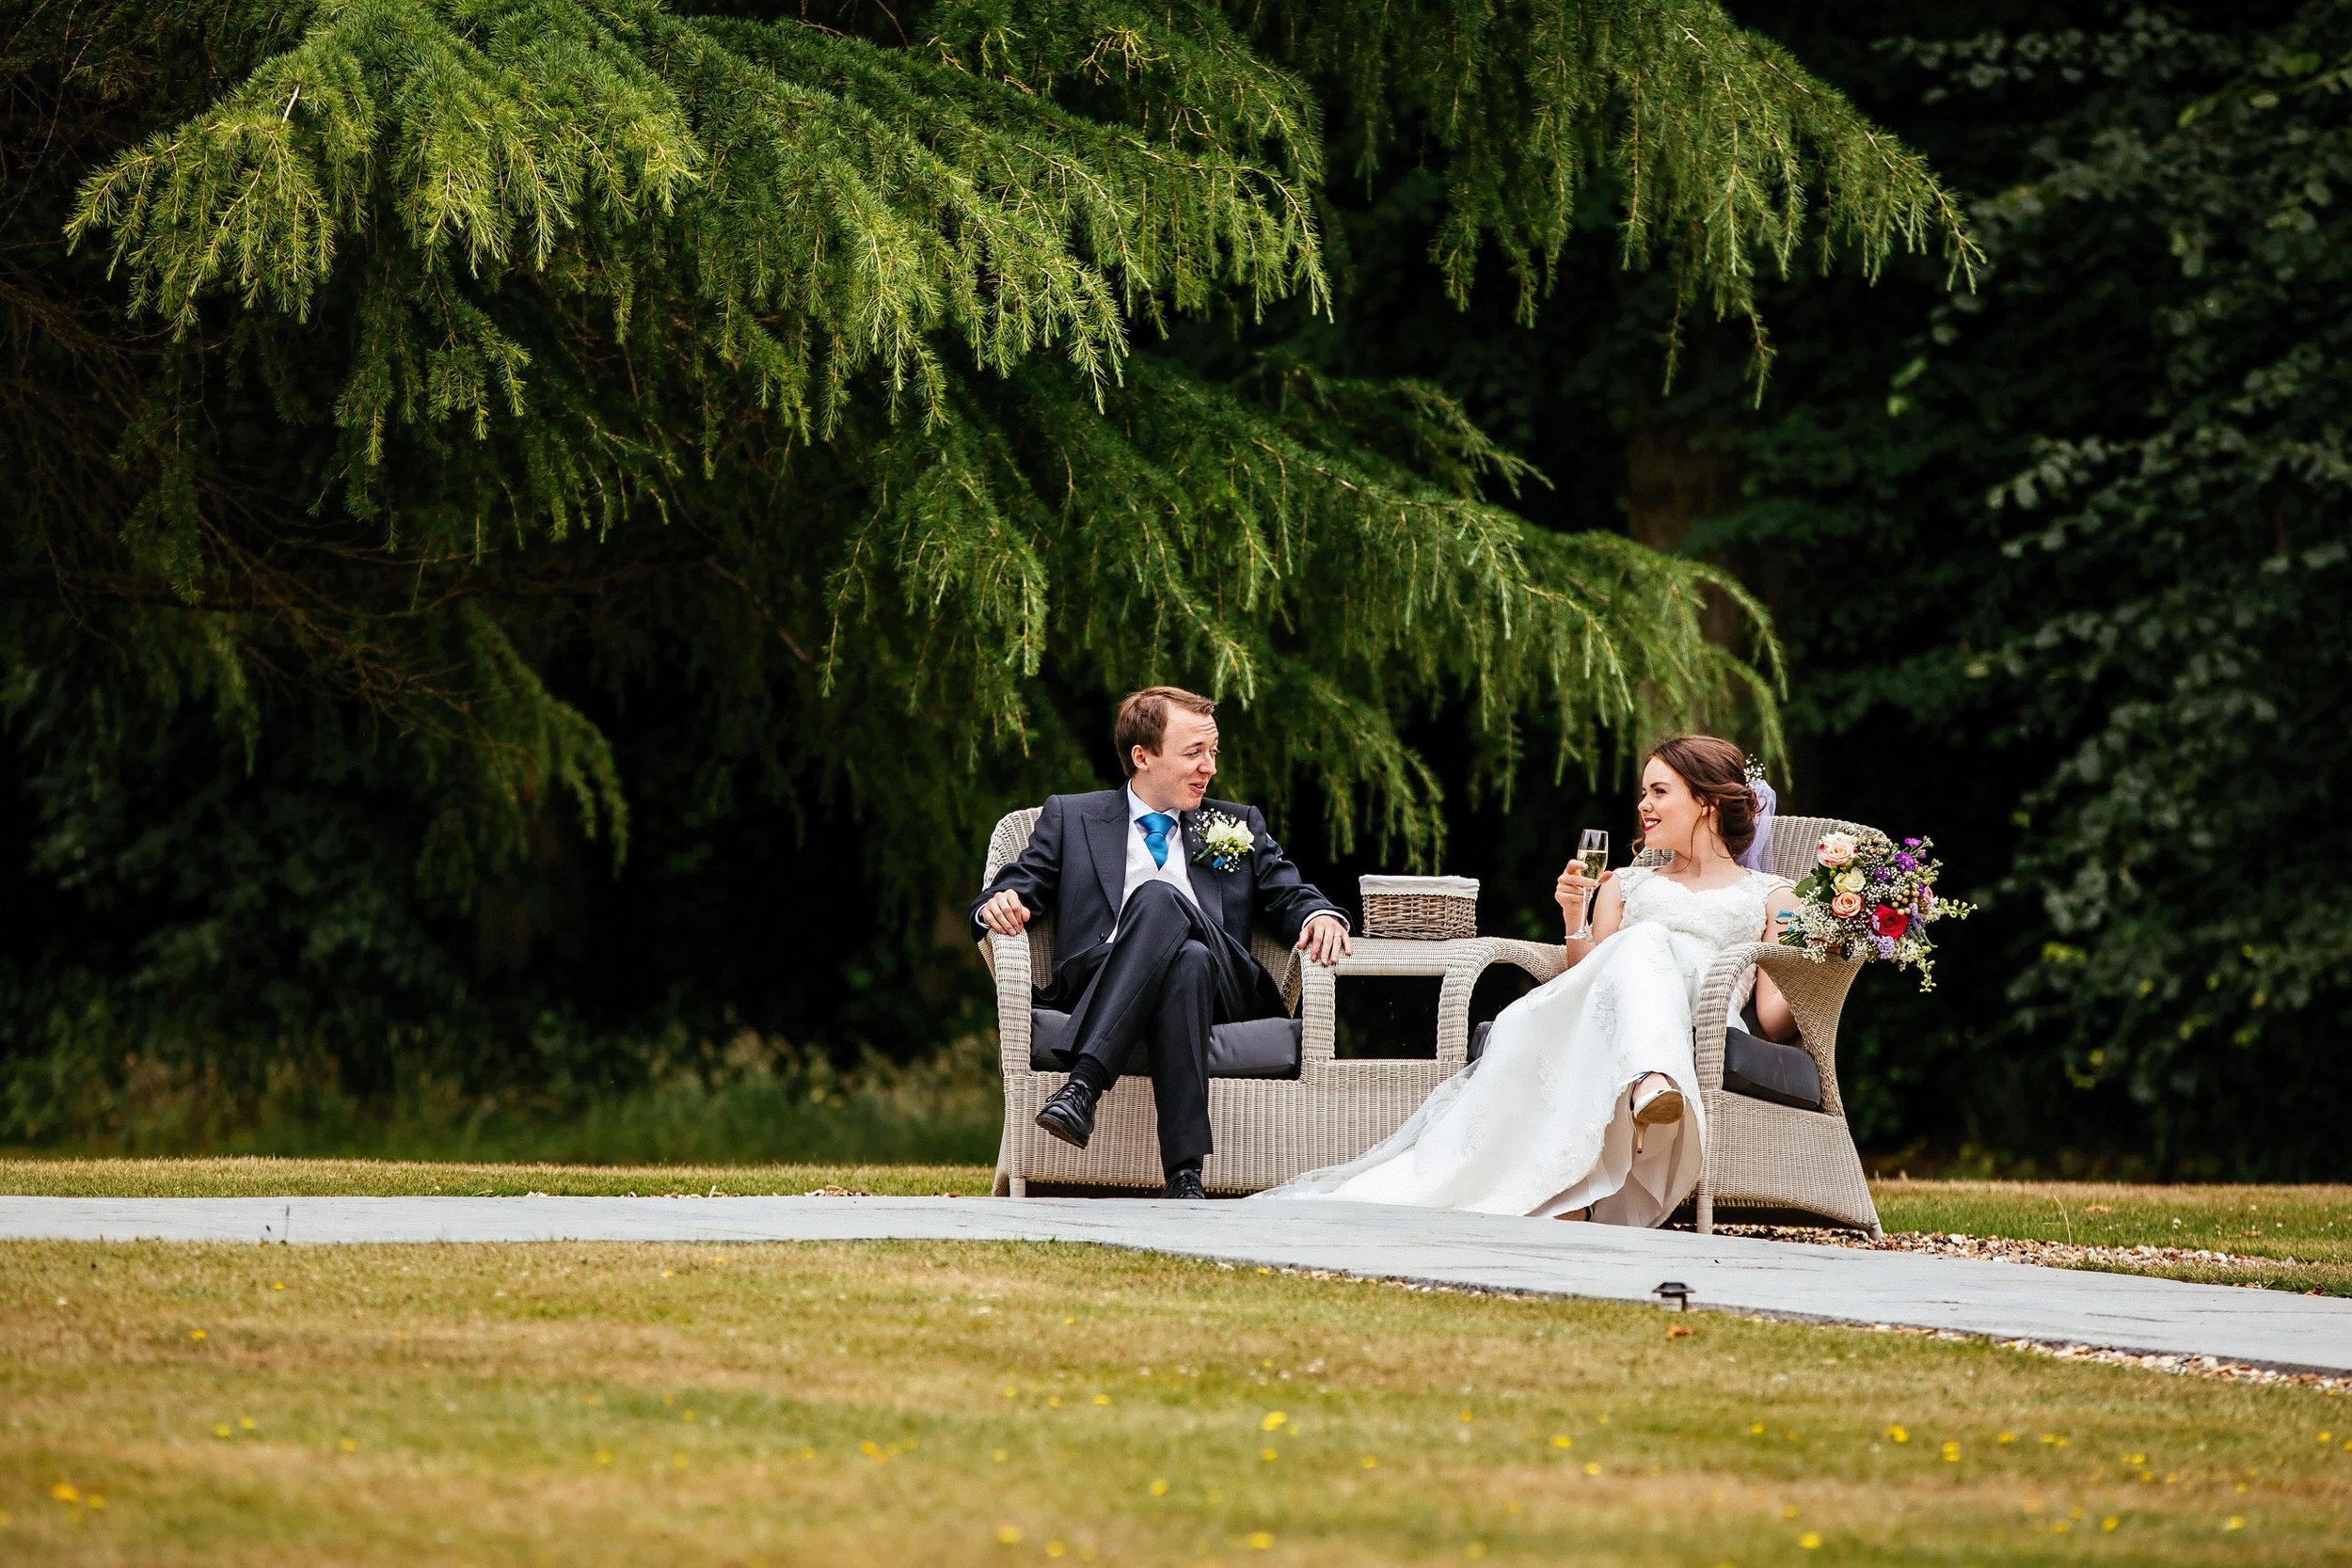 Florence-and-Ben-Wedding-Highlights-53.jpg